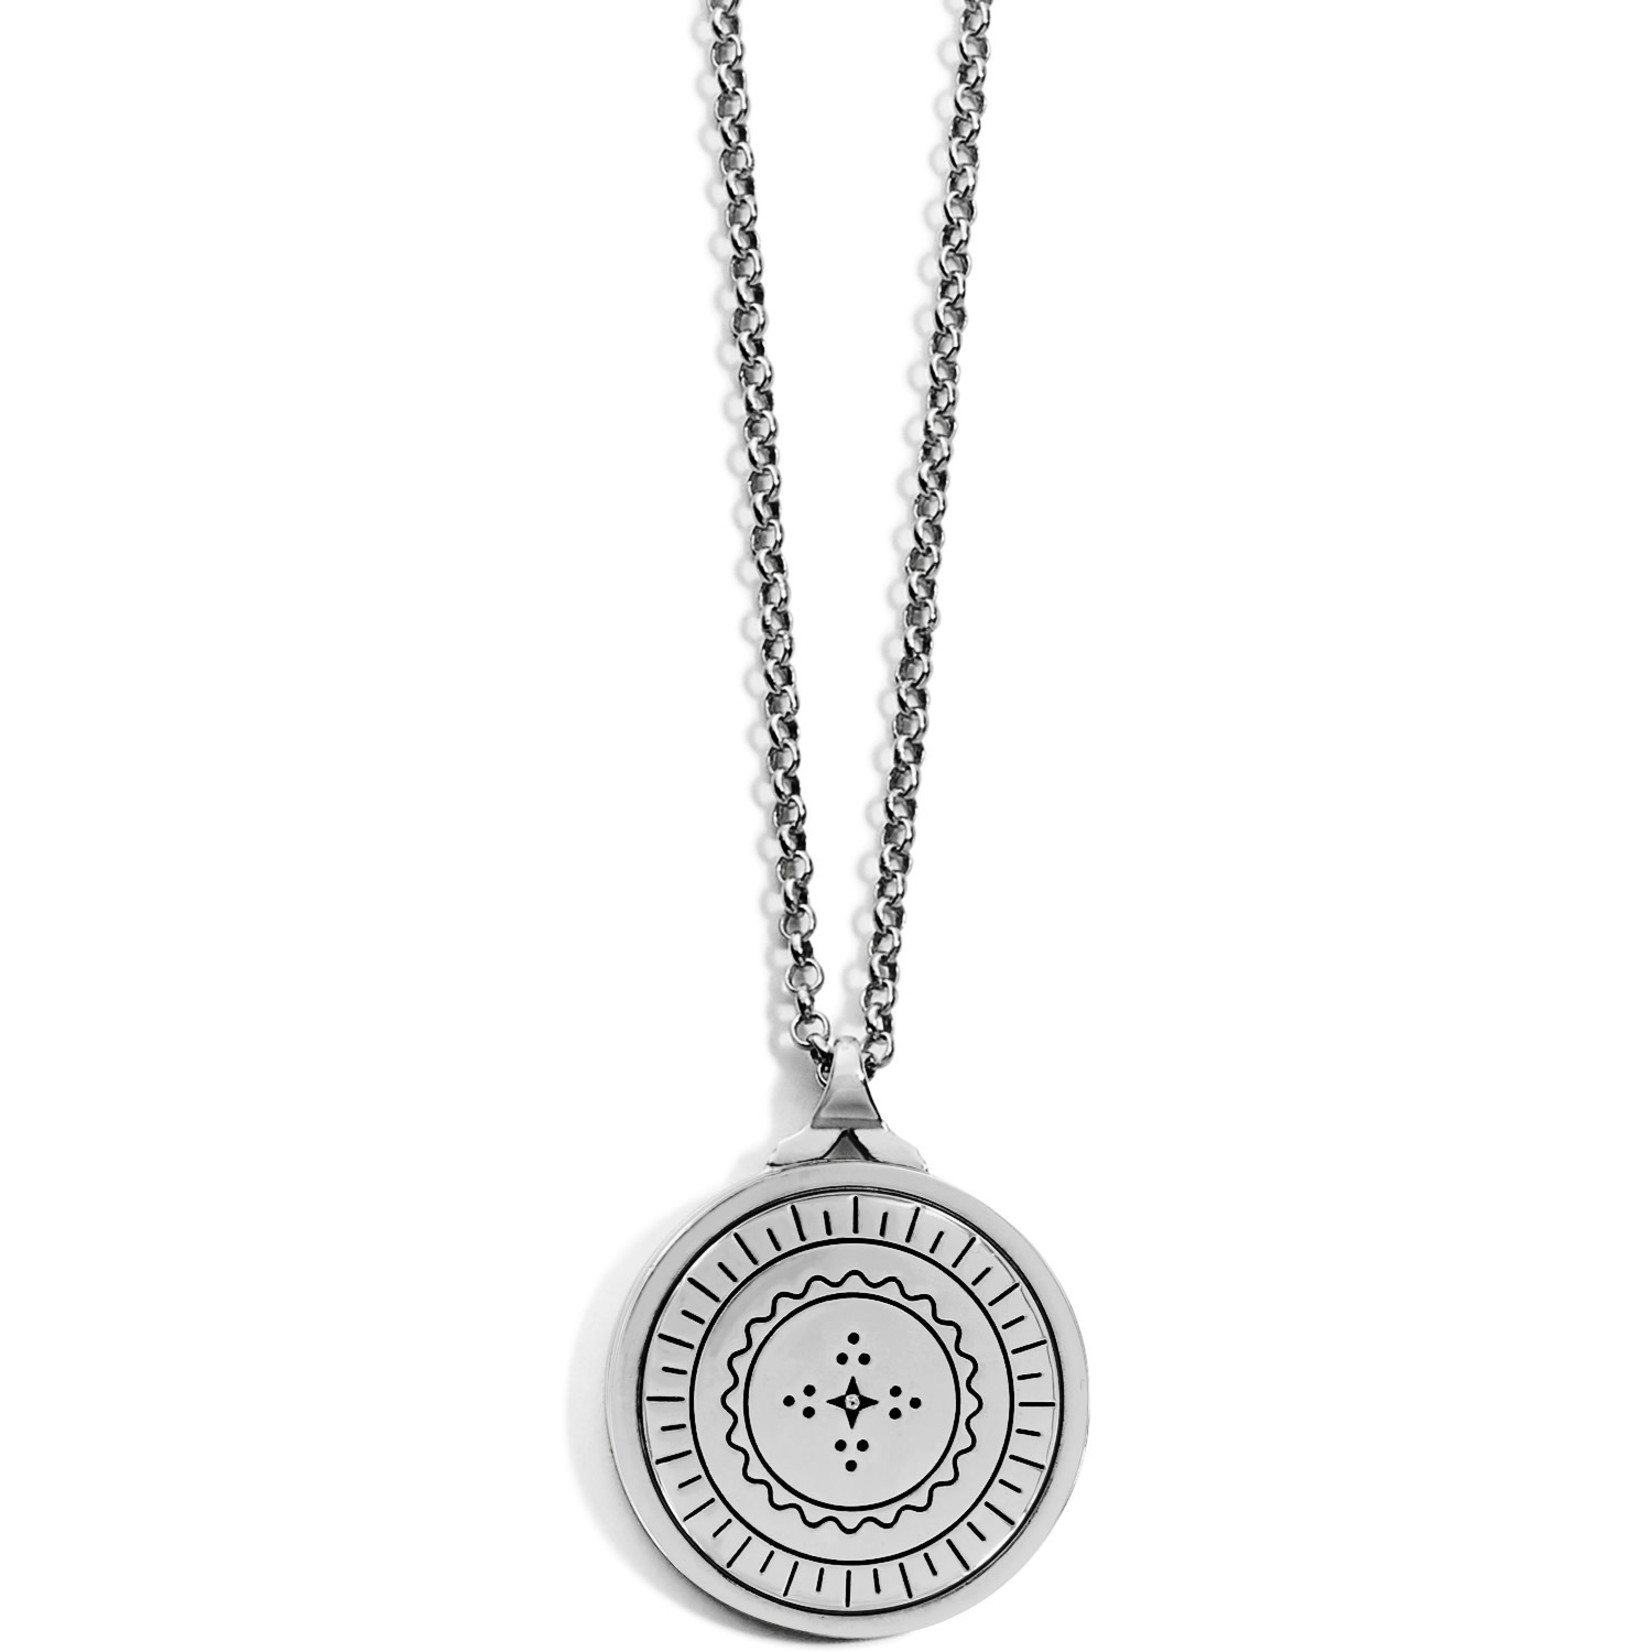 Brighton Marrakesh Mystique Pendant Necklace Silver-Blue